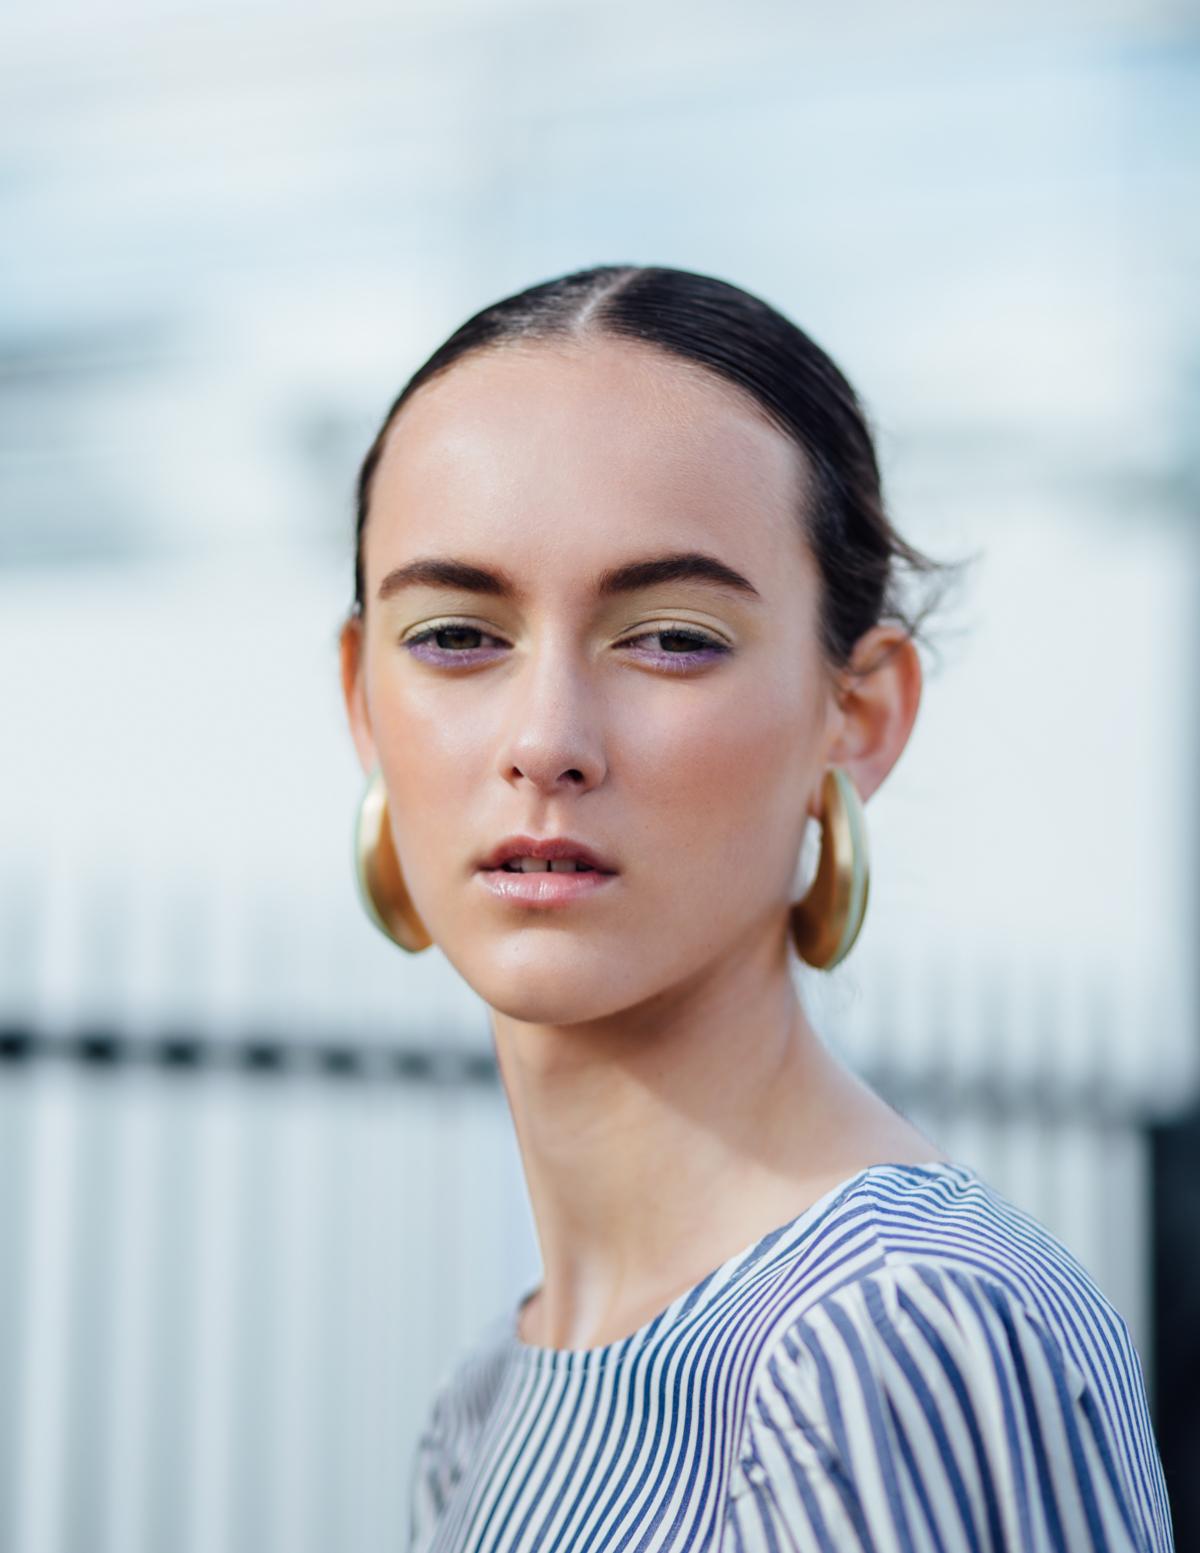 Kat_Terek_London_Bohemian_Editorial_Fashion_Photographer_Lindenstaub_Oriental_Lucys_Magazine-5